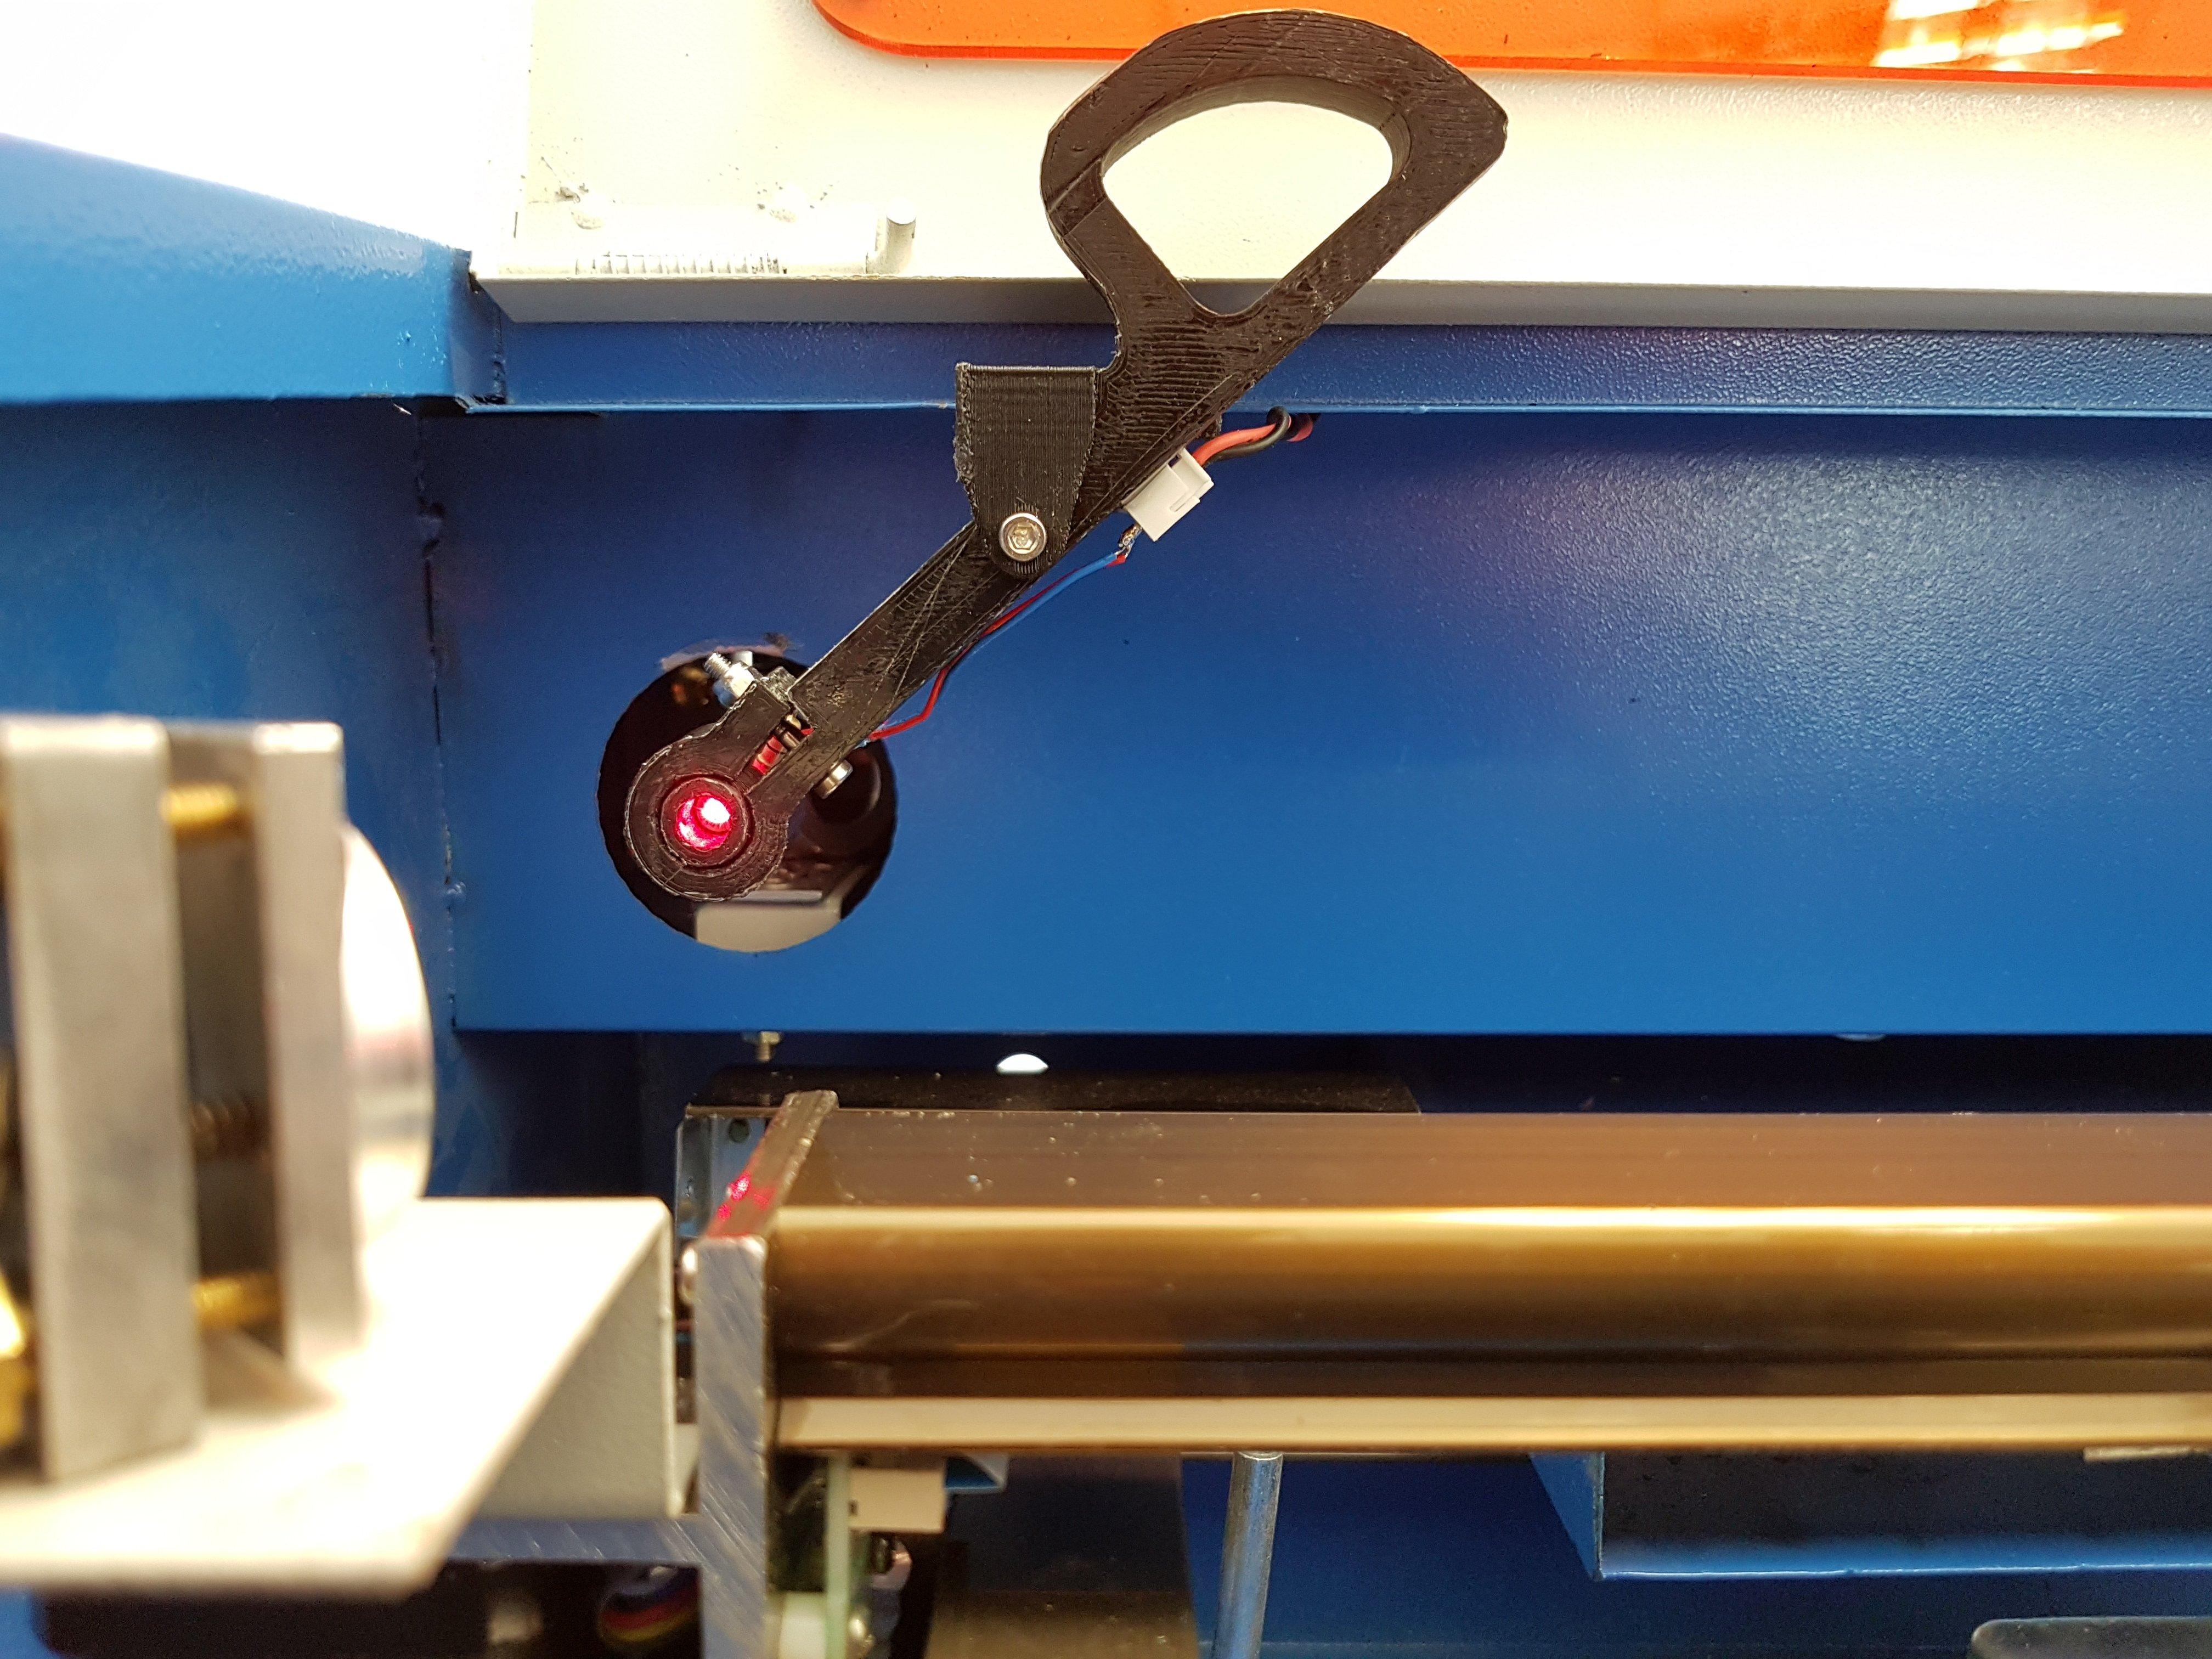 Modified laser pointer holder for K40 laser cutter by Jeffthegeek